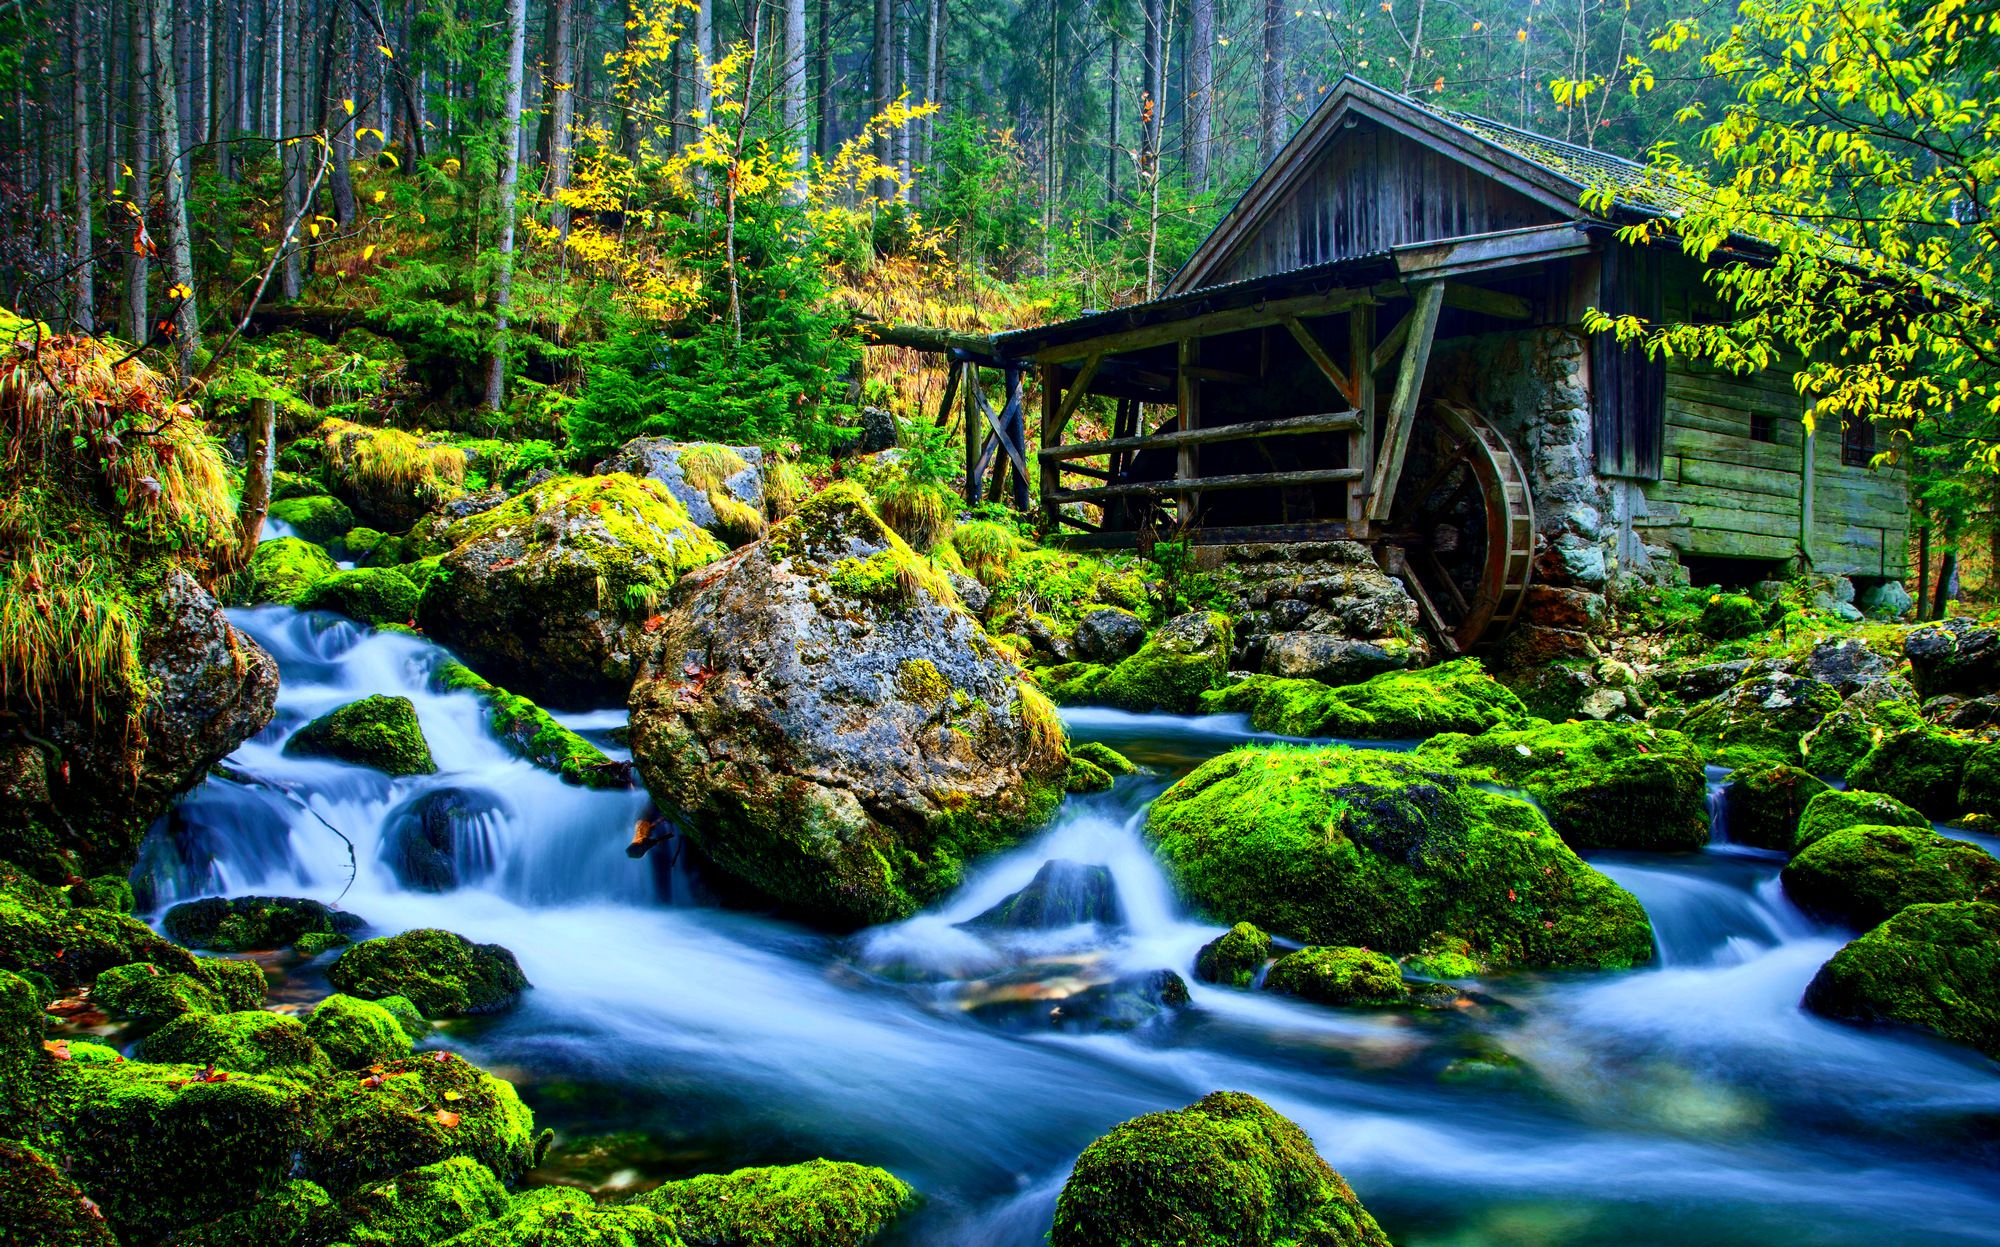 Abstract Water Landscape Nature 12137 Wallpaper Wallpaper hd 2000x1247